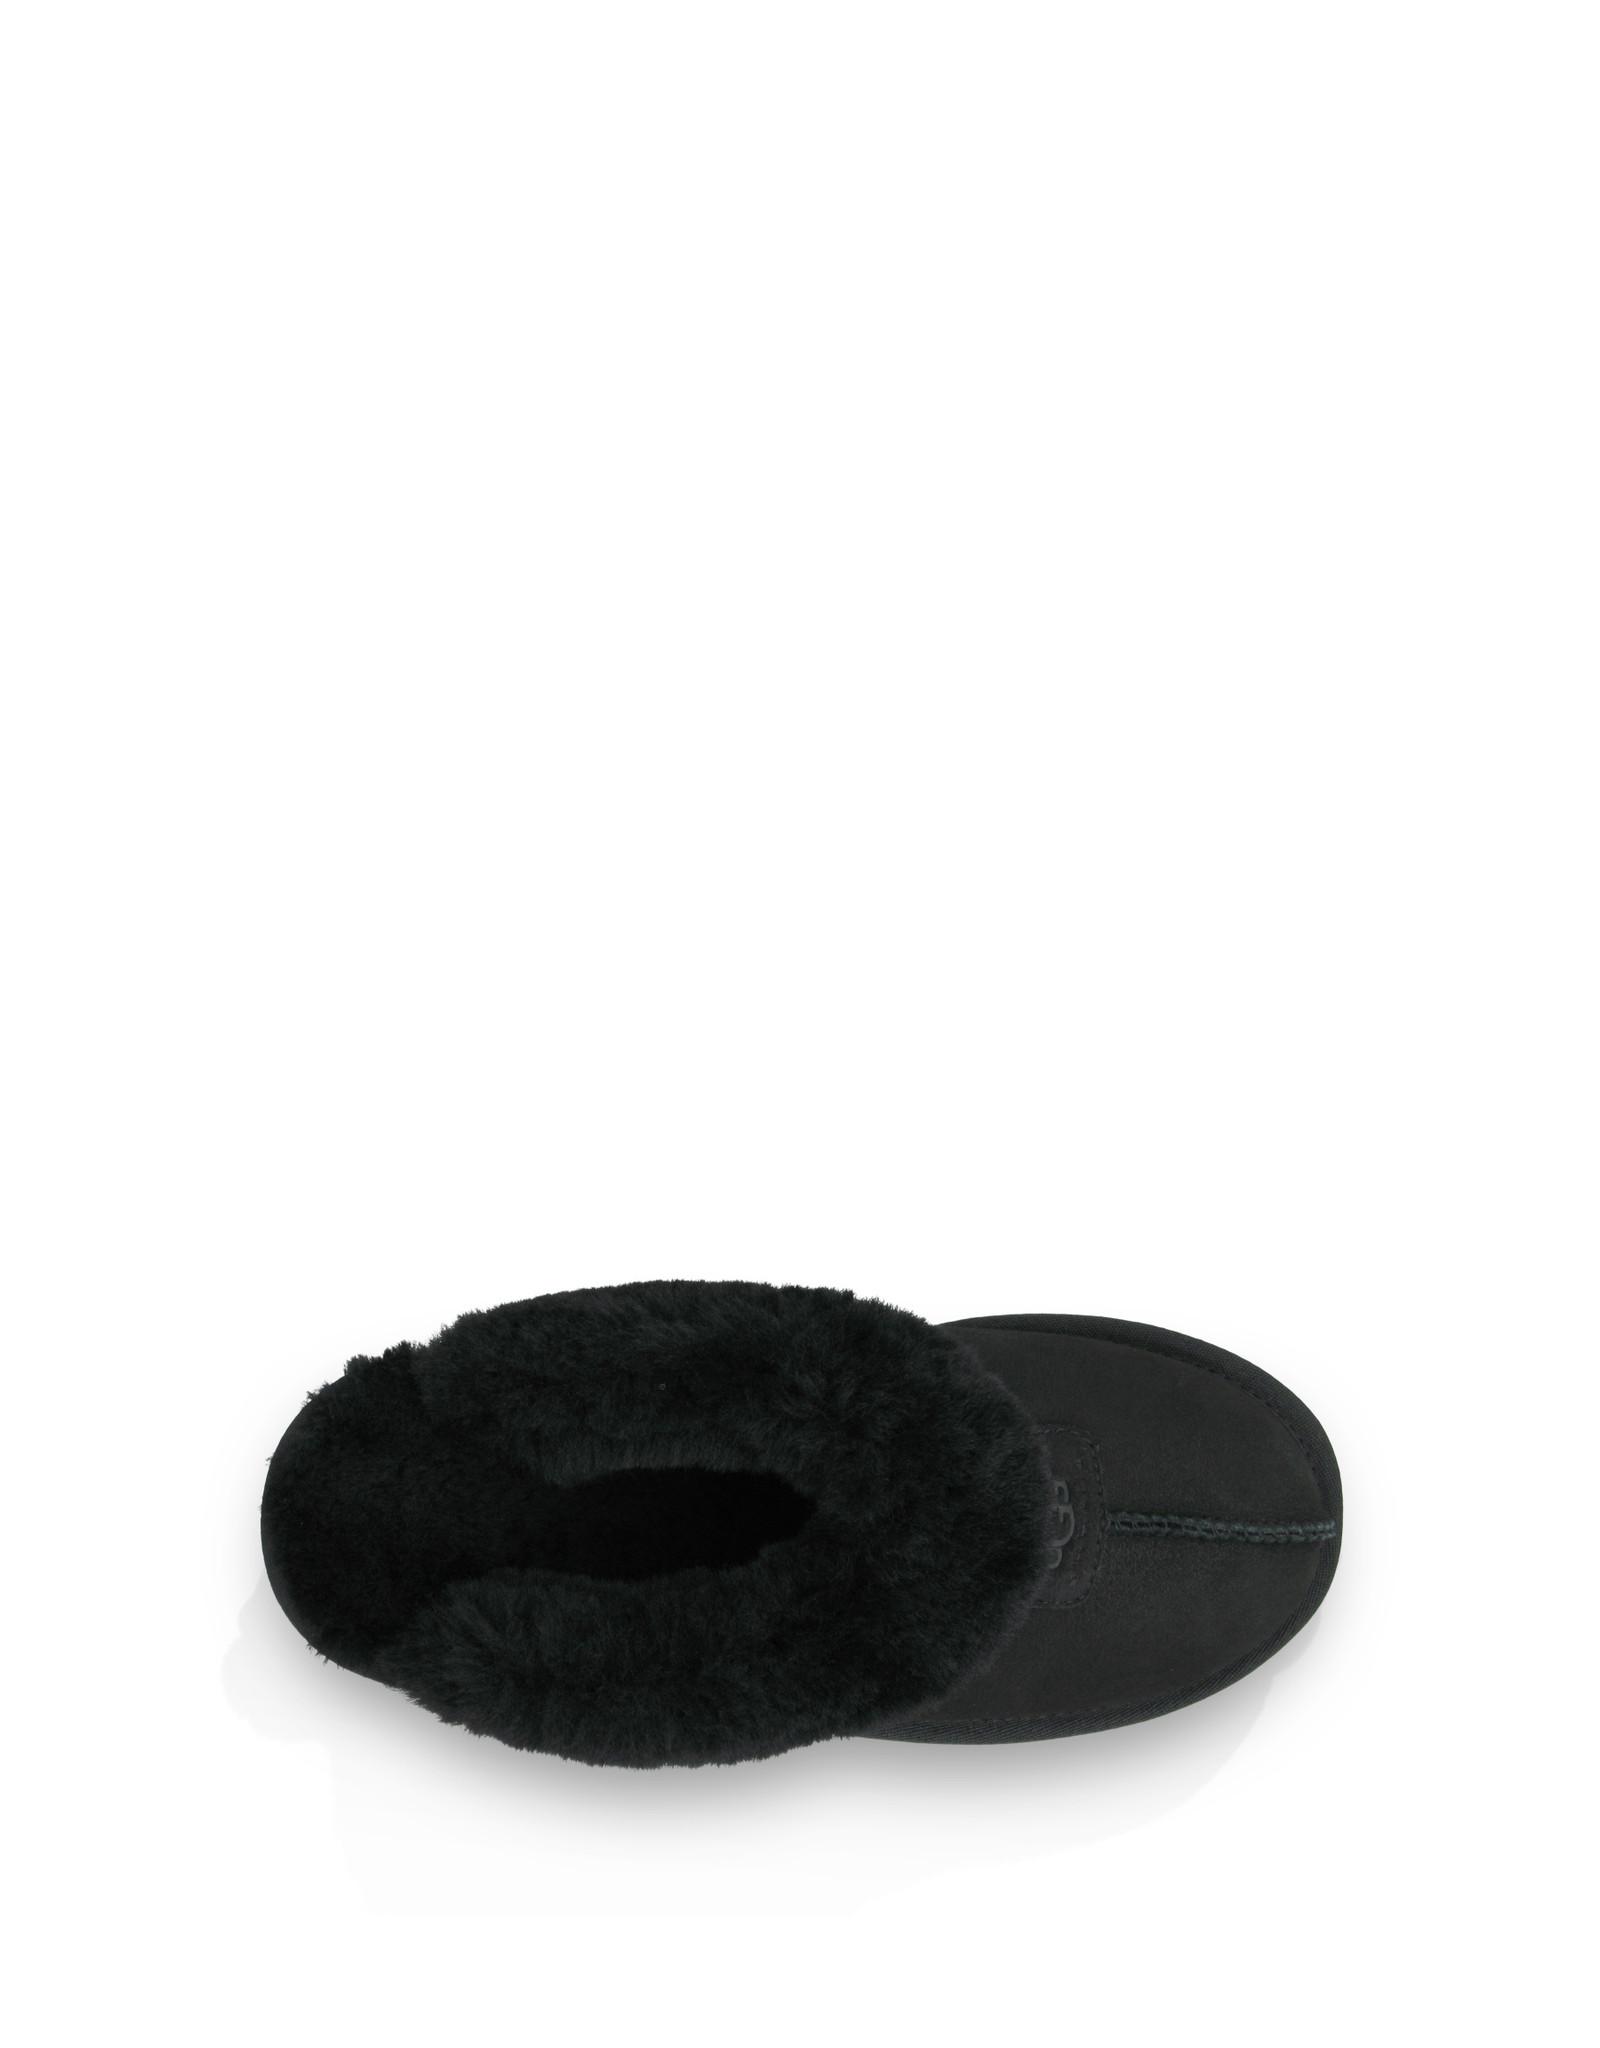 UGG WOMEN'S COQUETTE SLIPPER-BLACK